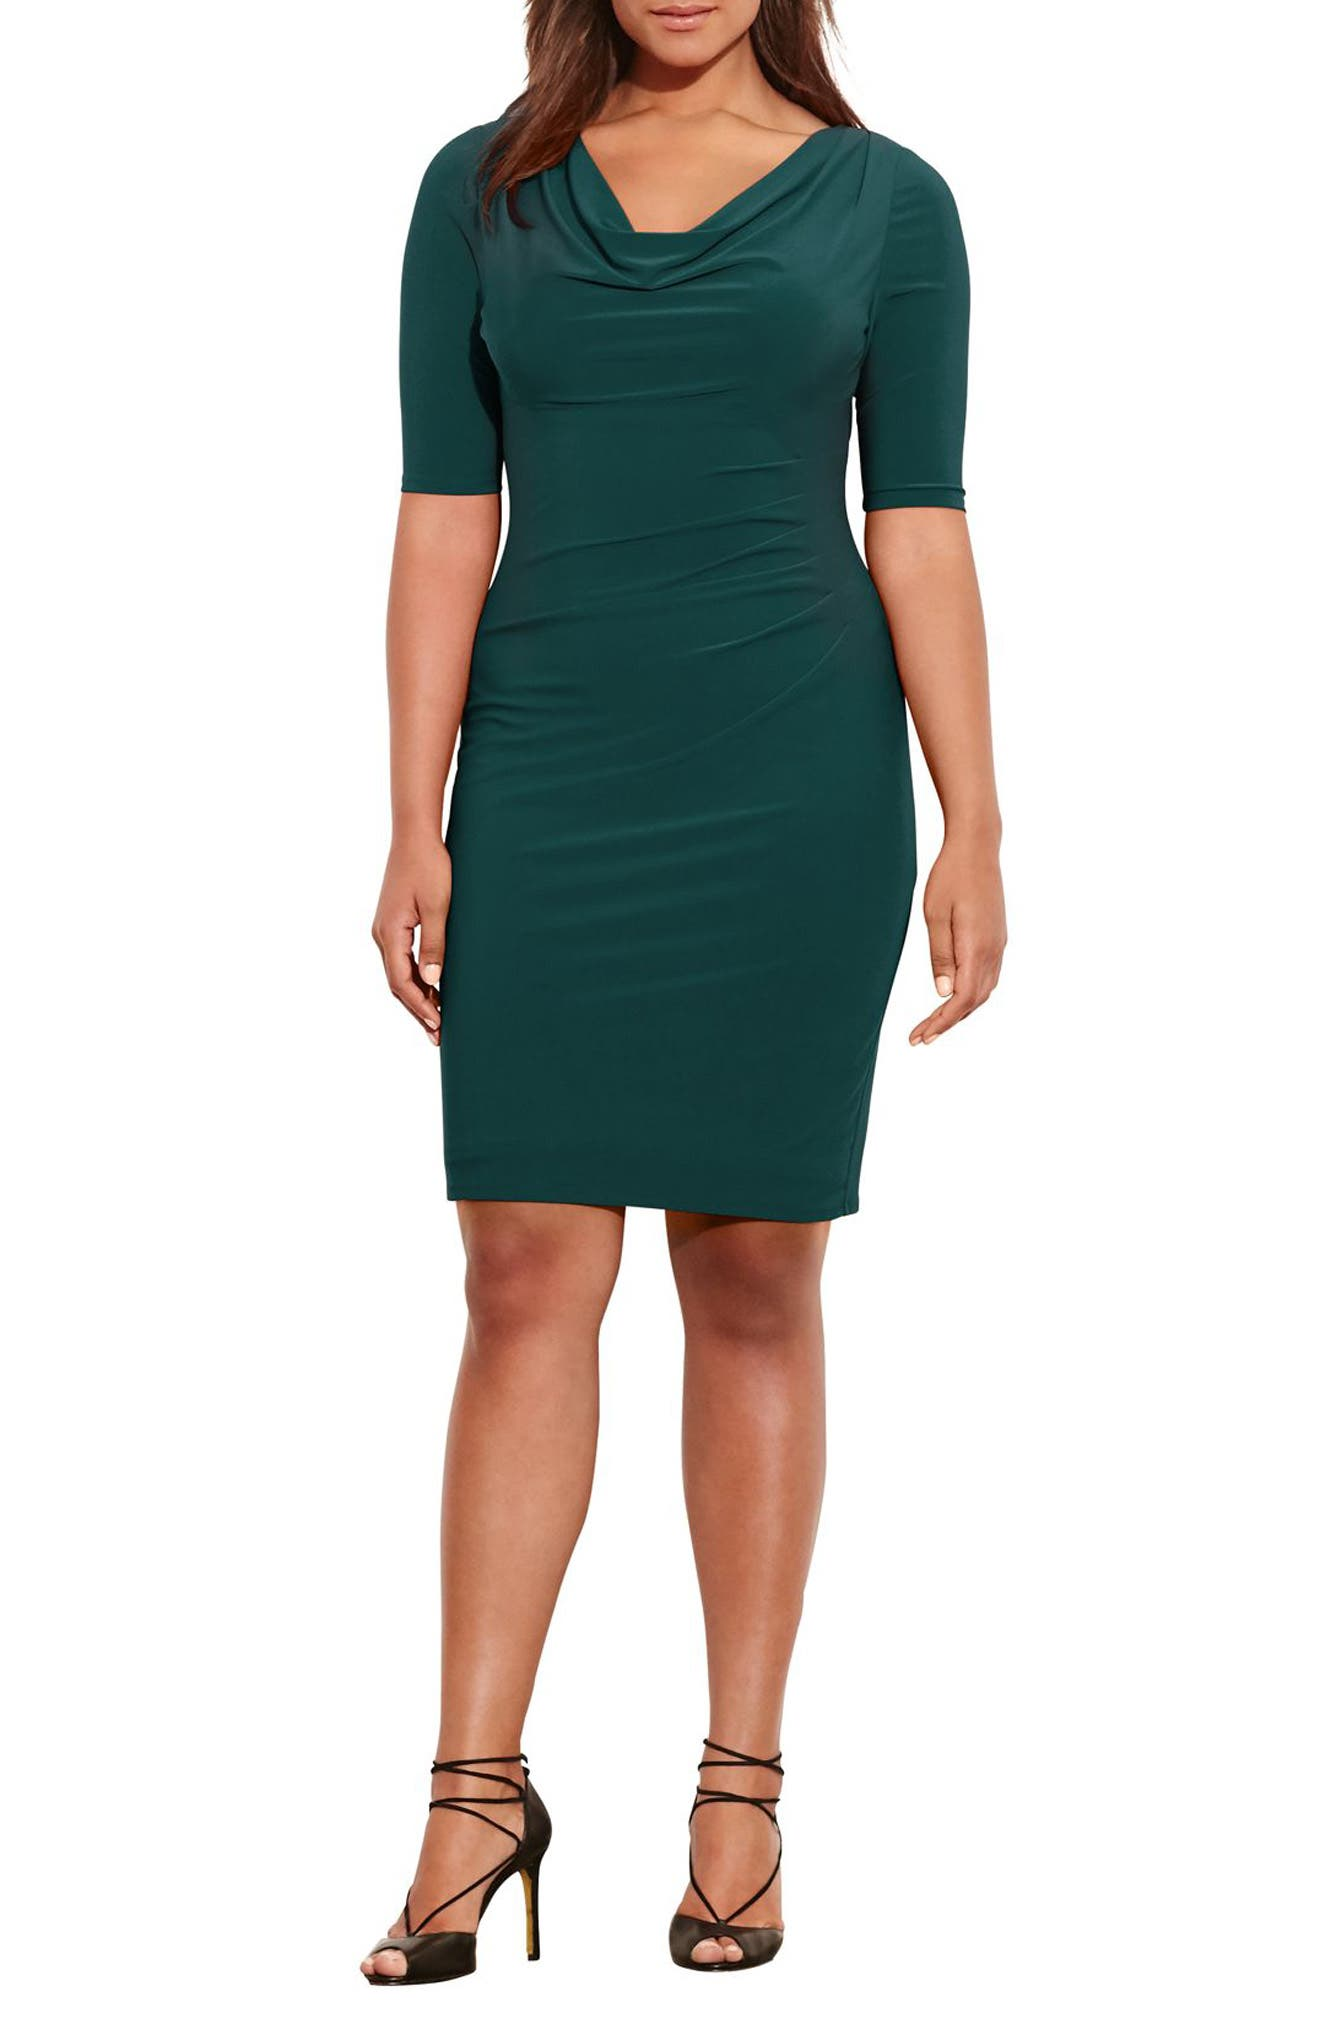 Alternate Image 1 Selected - Lauren Ralph Lauren Carleton Cowl Neck Jersey Dress (Plus Size)